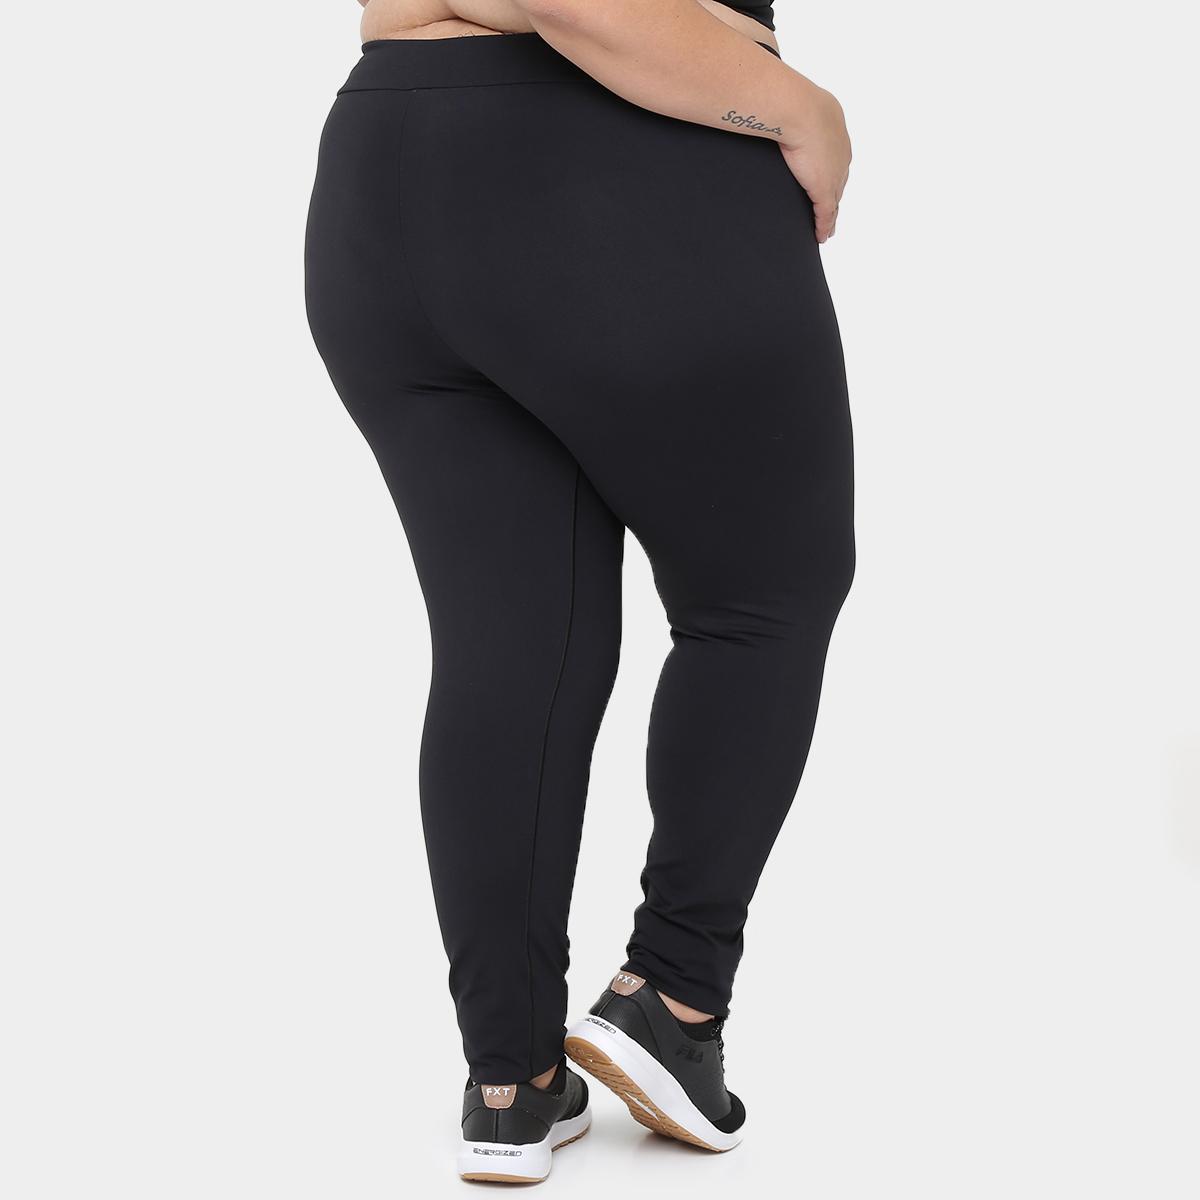 a10d8639a892 Legging Plus Size Preta Cotton Cintura Alta Elastico No Cos | Elo7